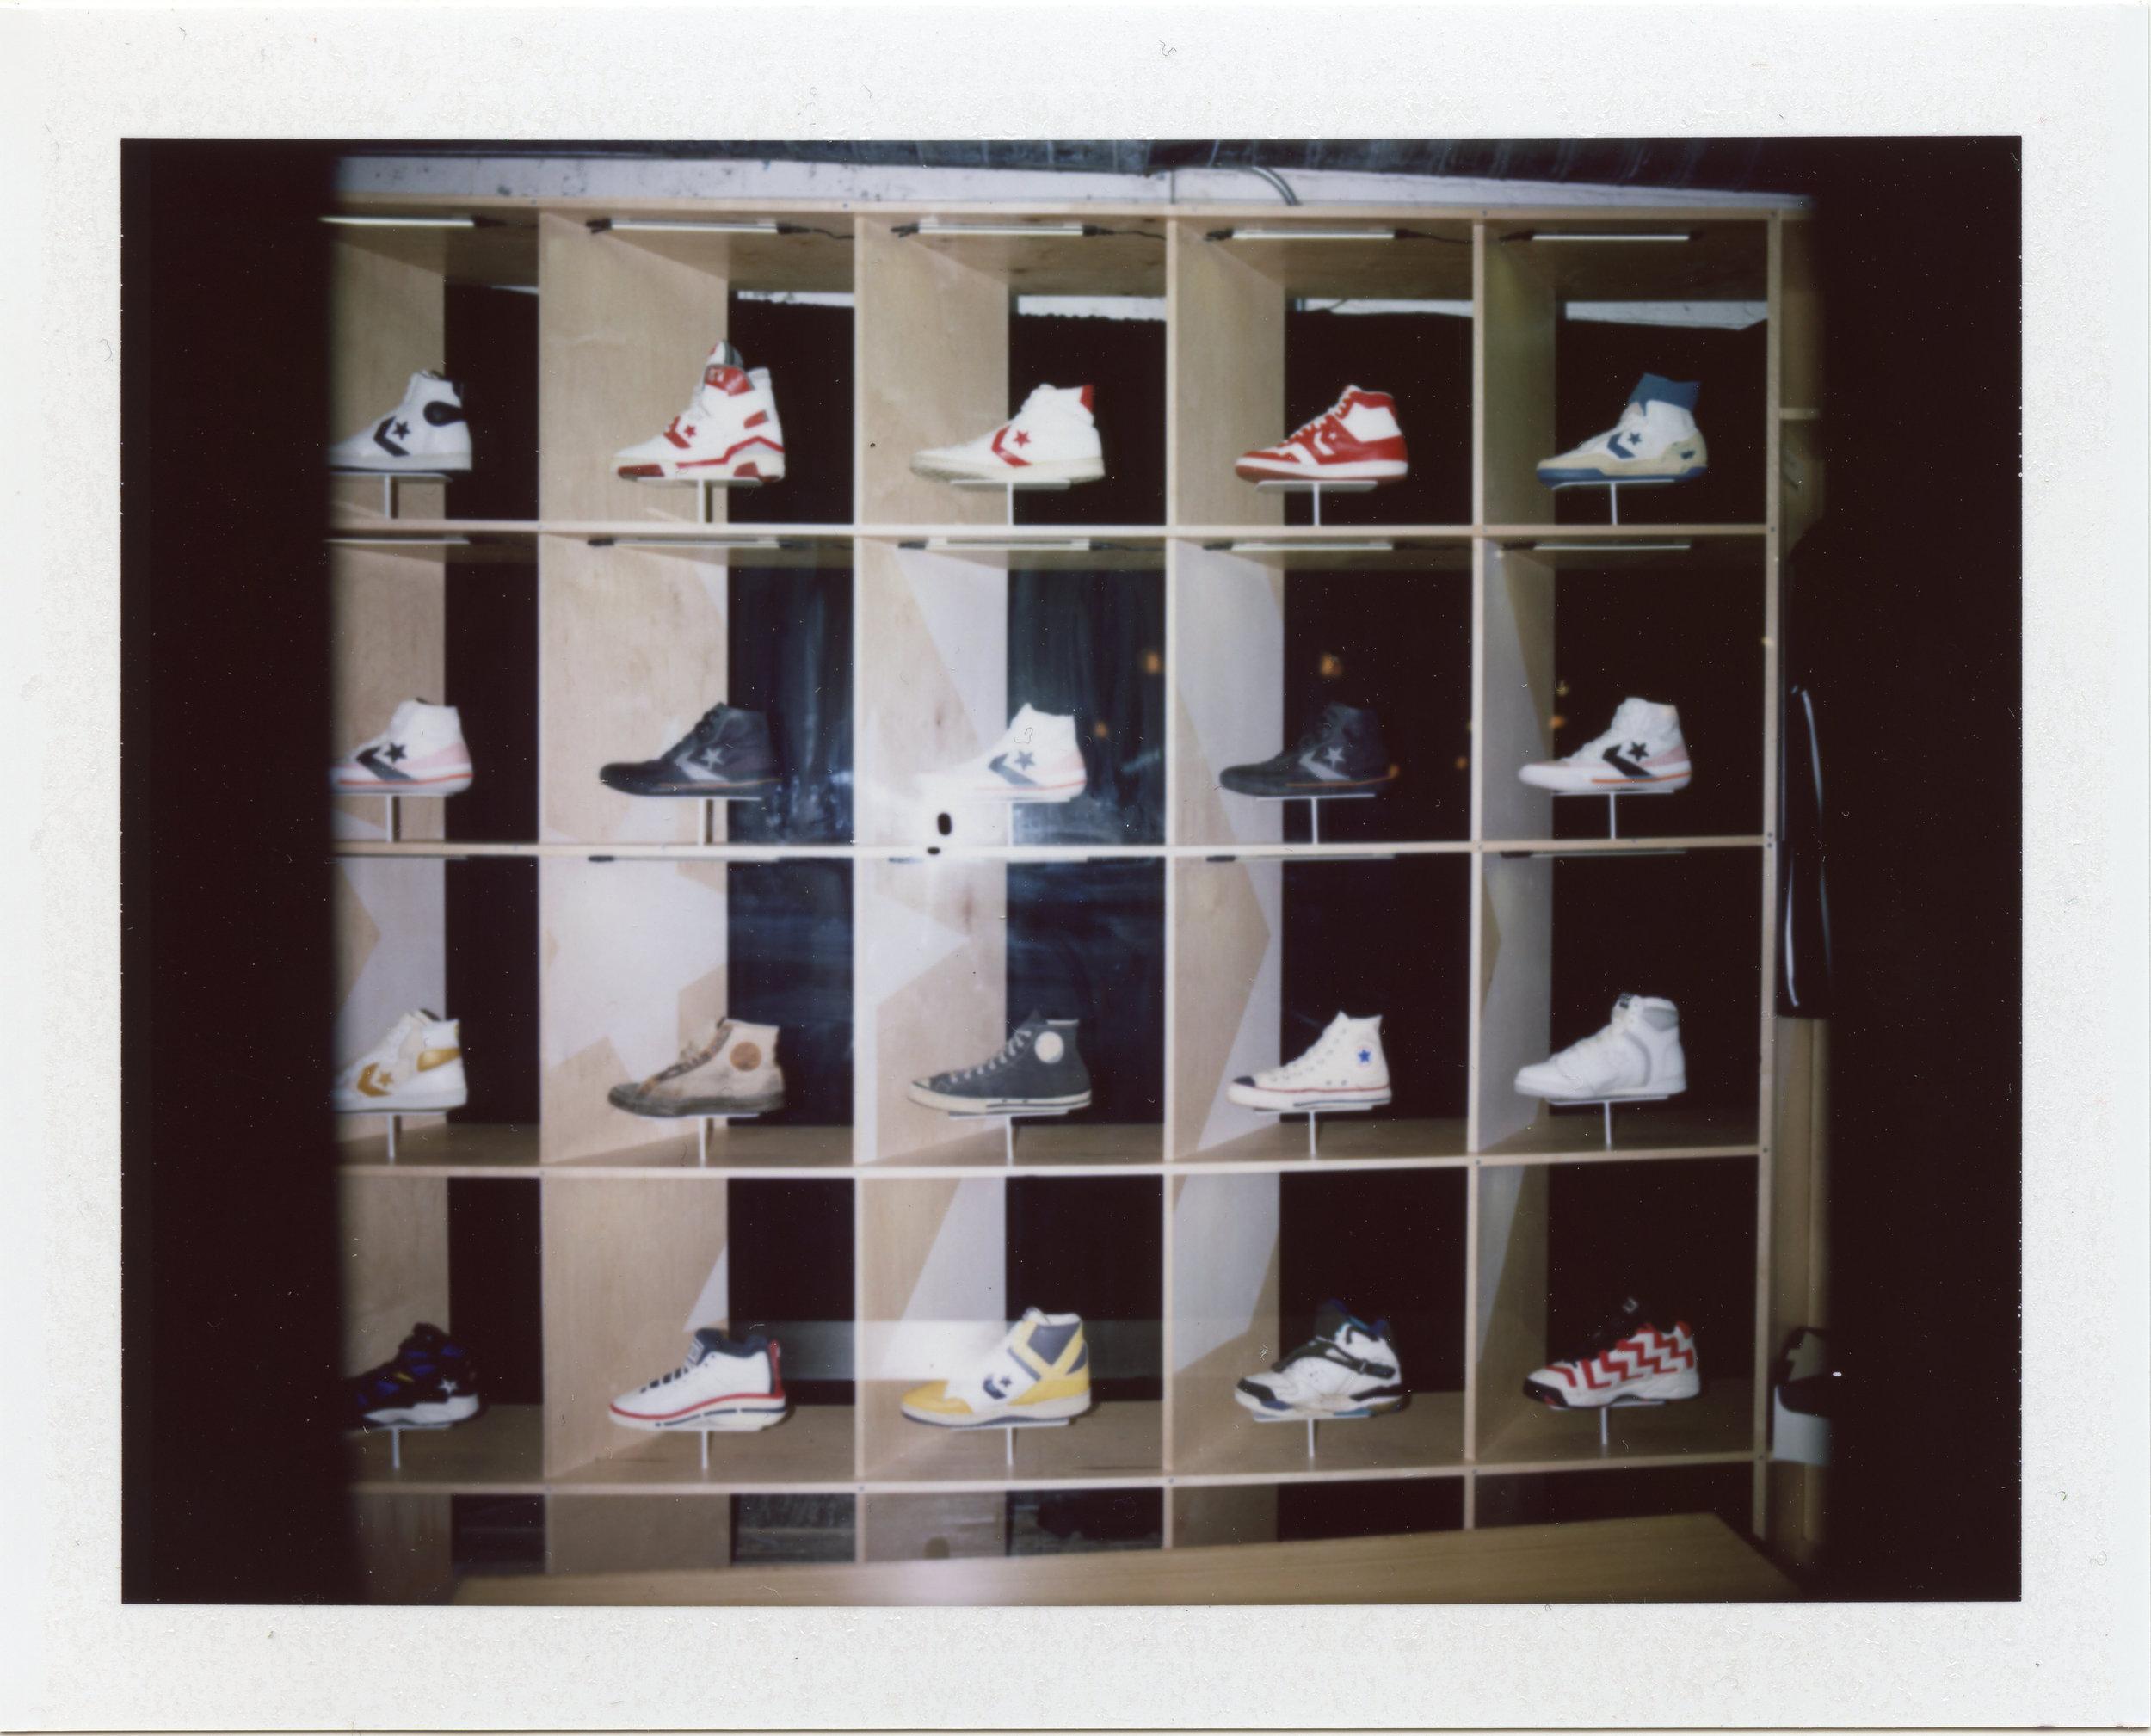 Converse_OT_Polaroid_6.jpg